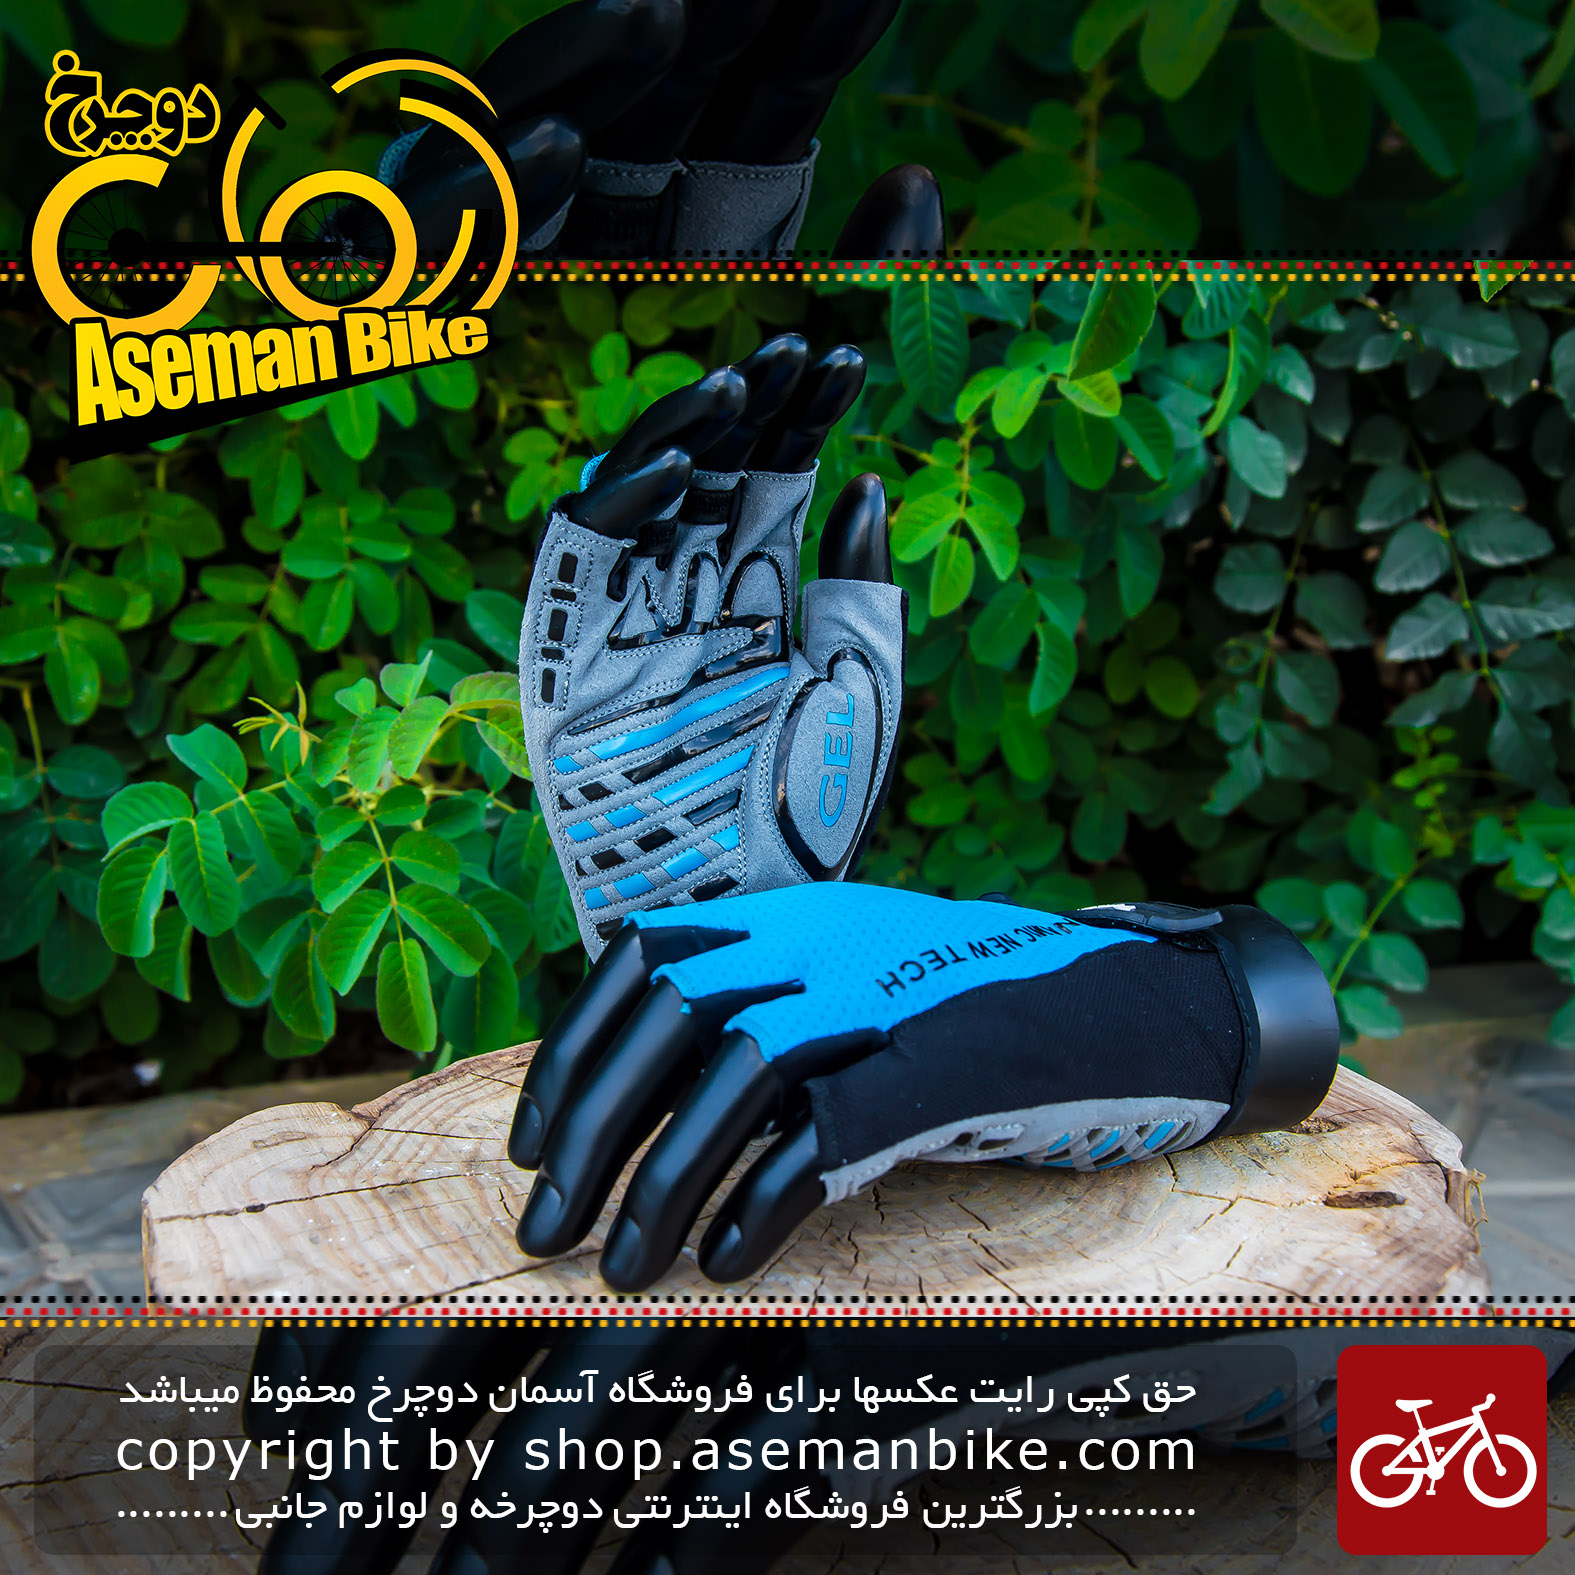 دستکش دوچرخه سواری دینامیک آبی Dynamic Gloves